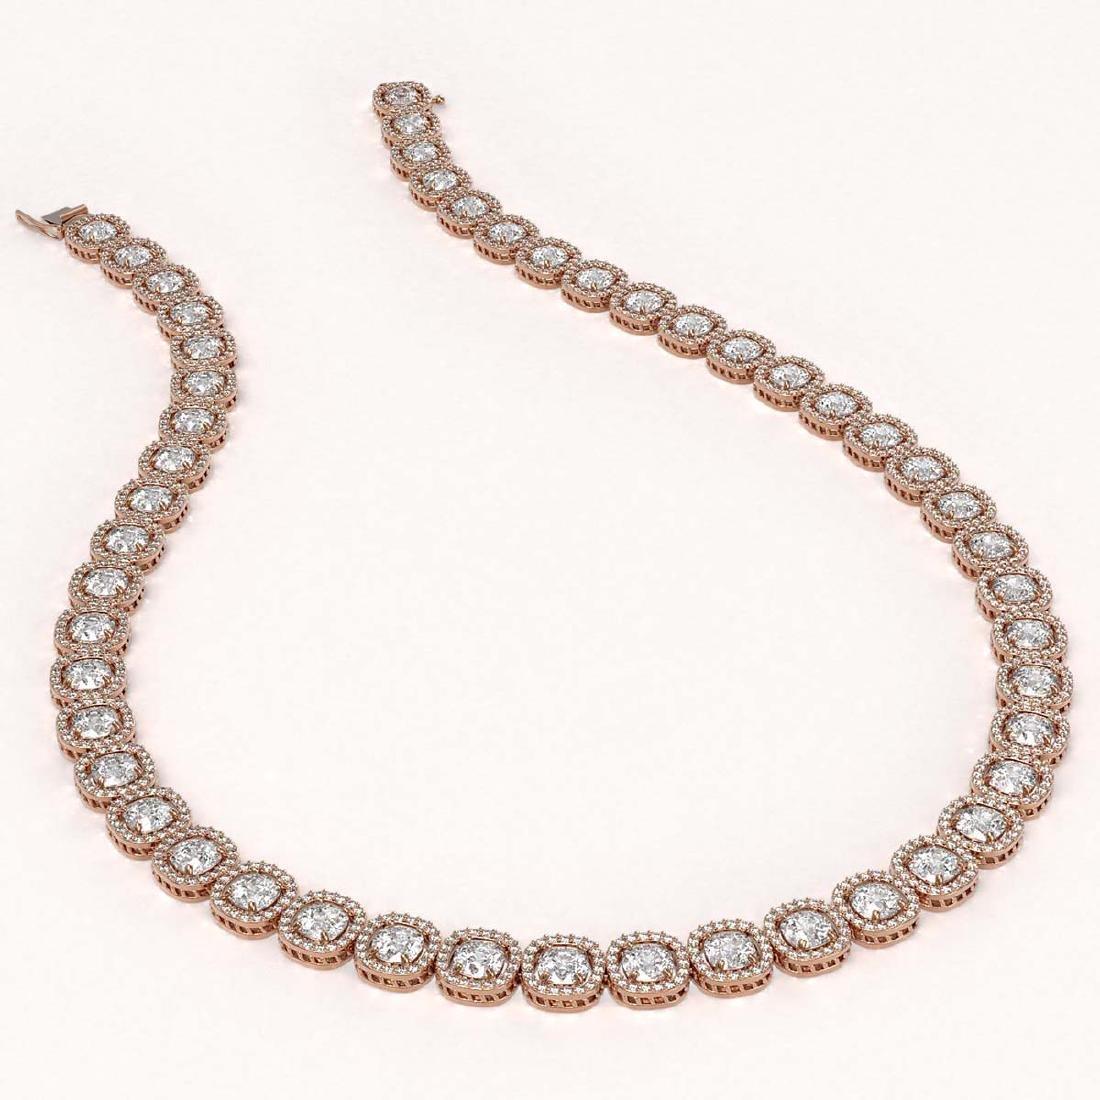 32.64 CTW Cushion Diamond Designer Necklace 18K Rose - 2